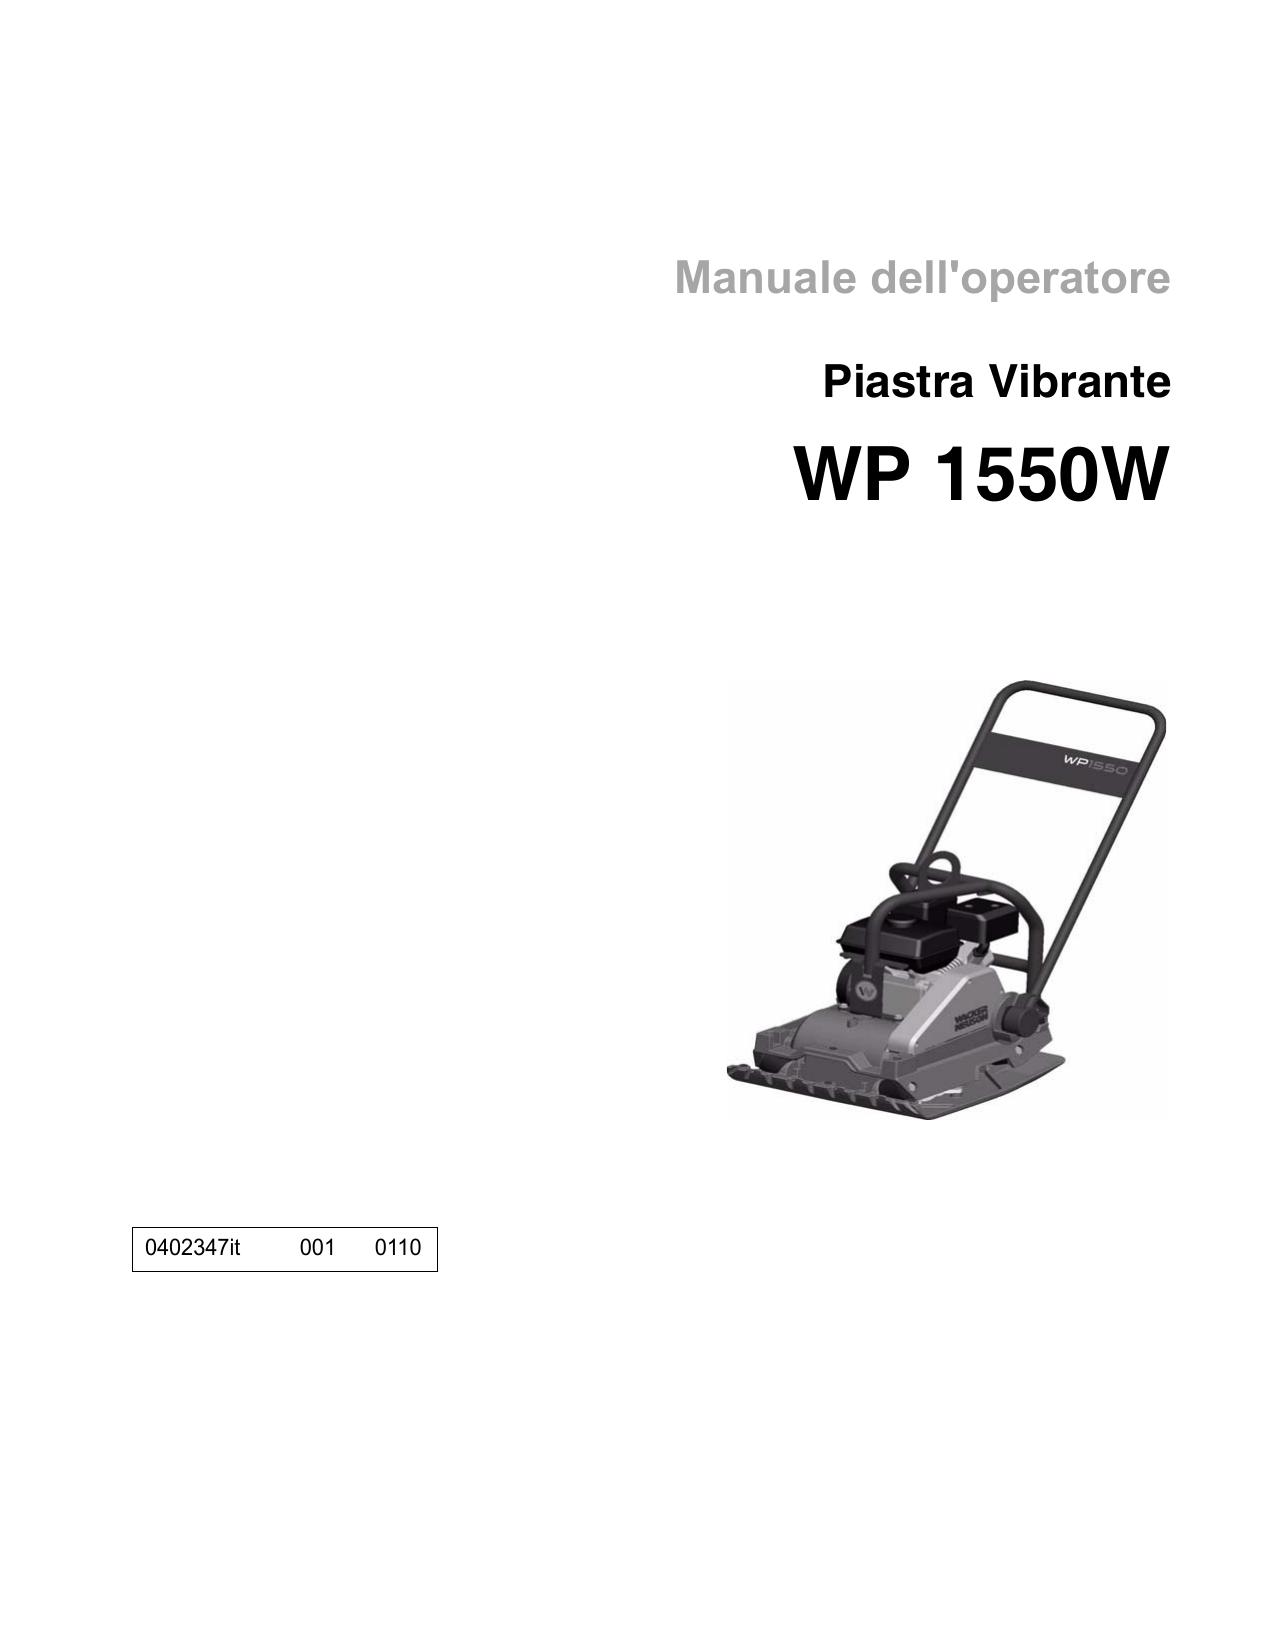 Wacker Neuson WP1550W Single direction Vibratory Plate